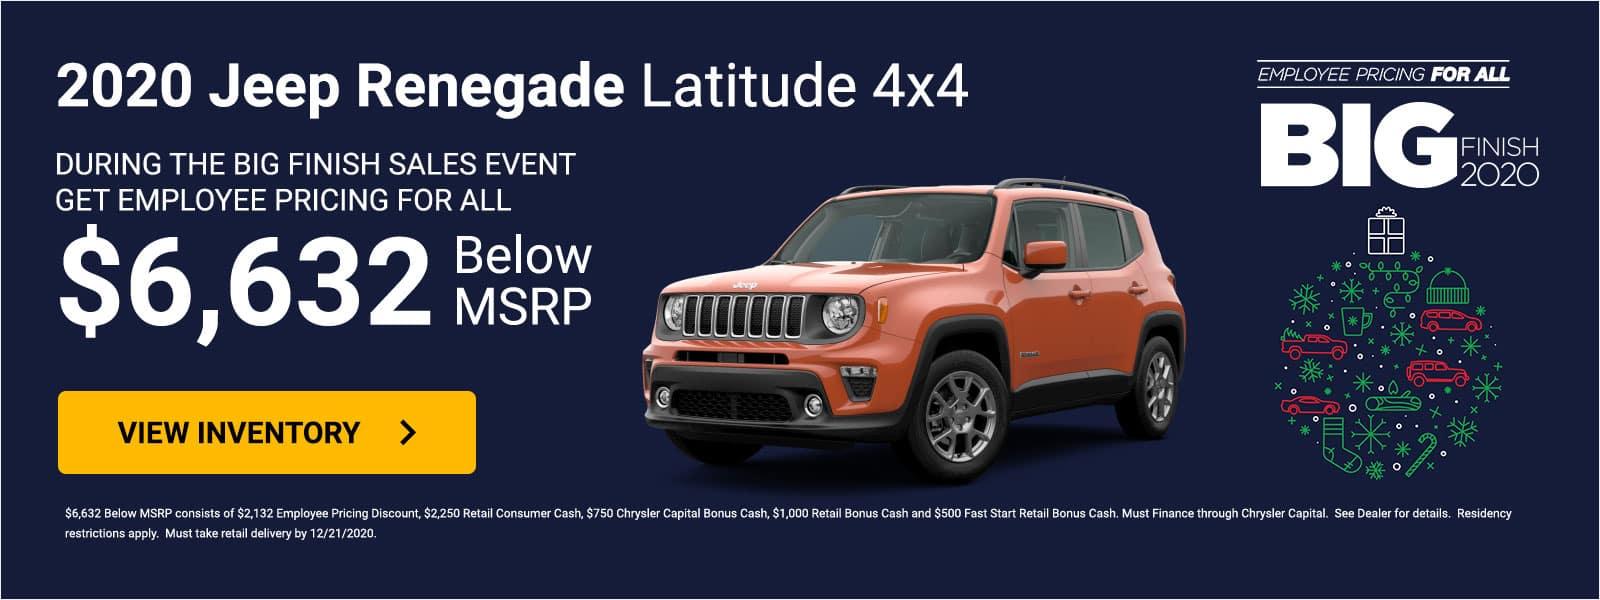 MABC_Banners_1600x600_2020-12_509913_20-Jeep-Renegade-2